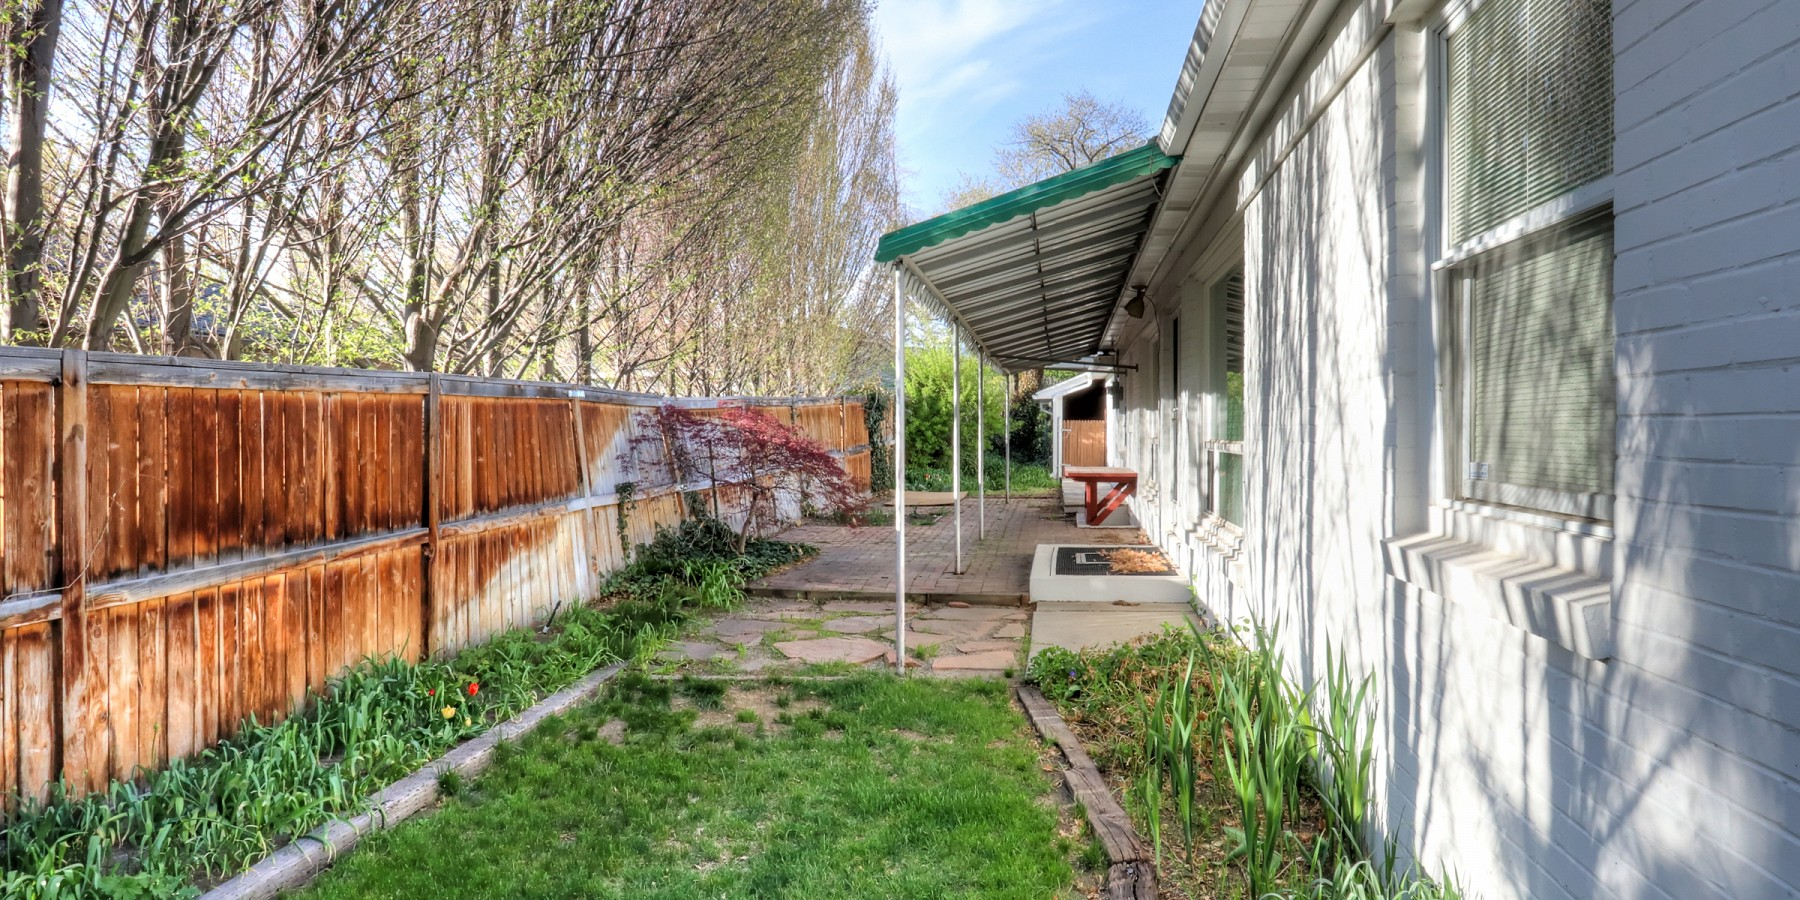 1815 E. Millbrook Road, Salt Lake City, UT 84106